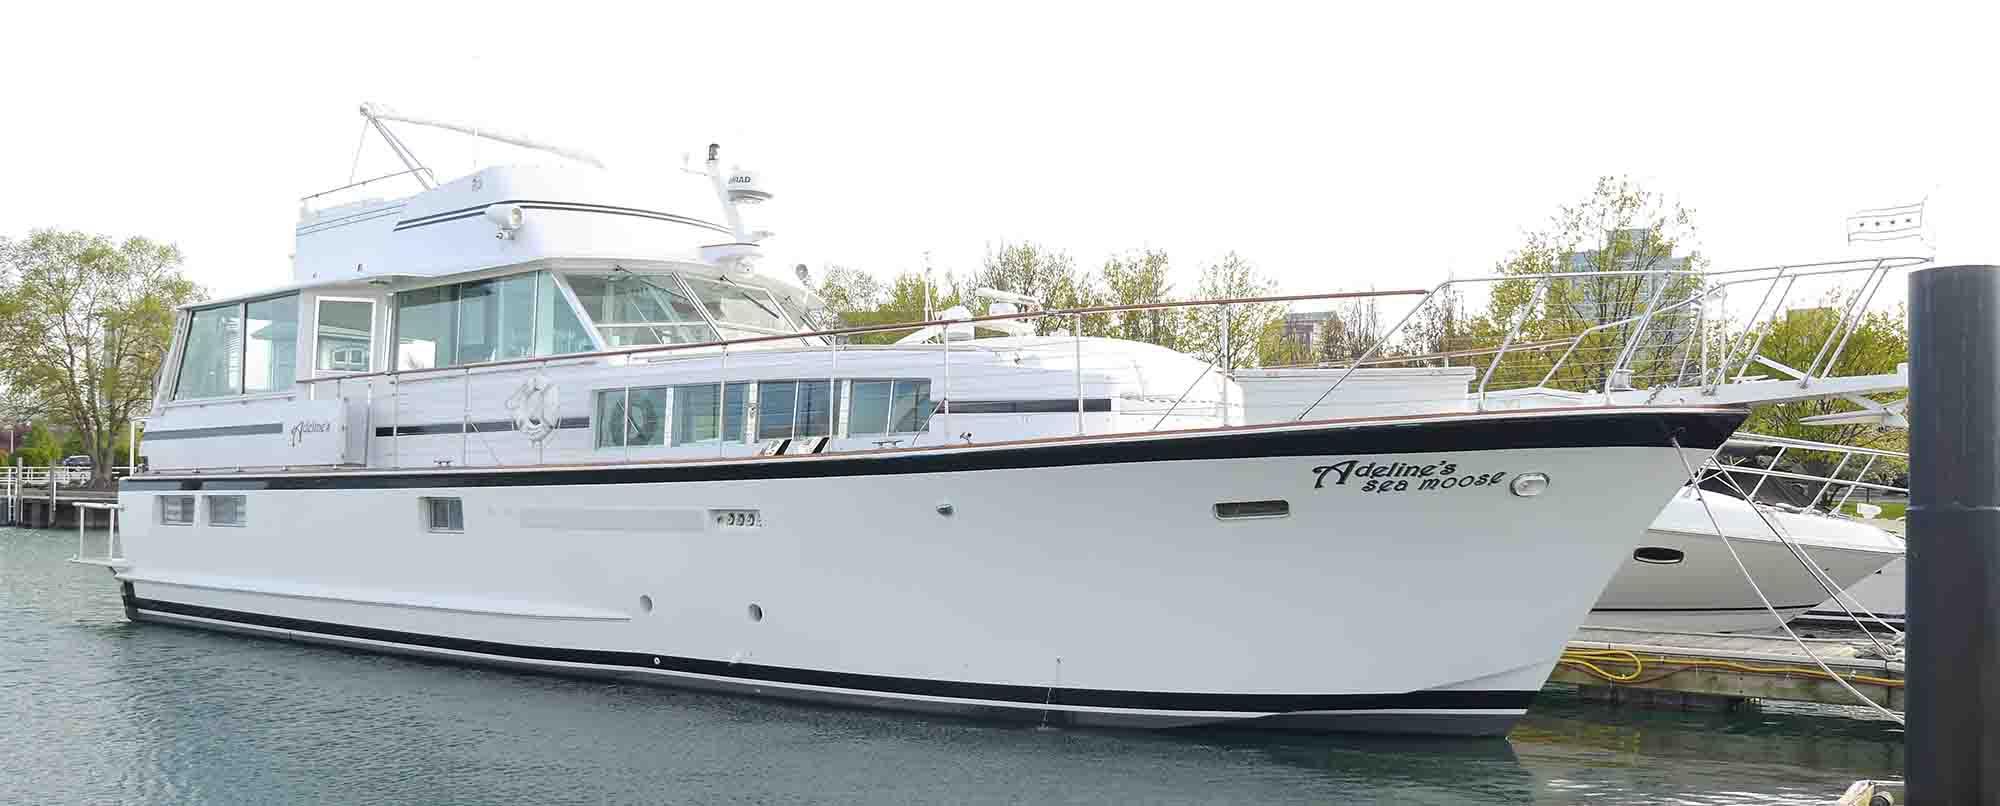 Chicago Lake Michigan Boat Rentals